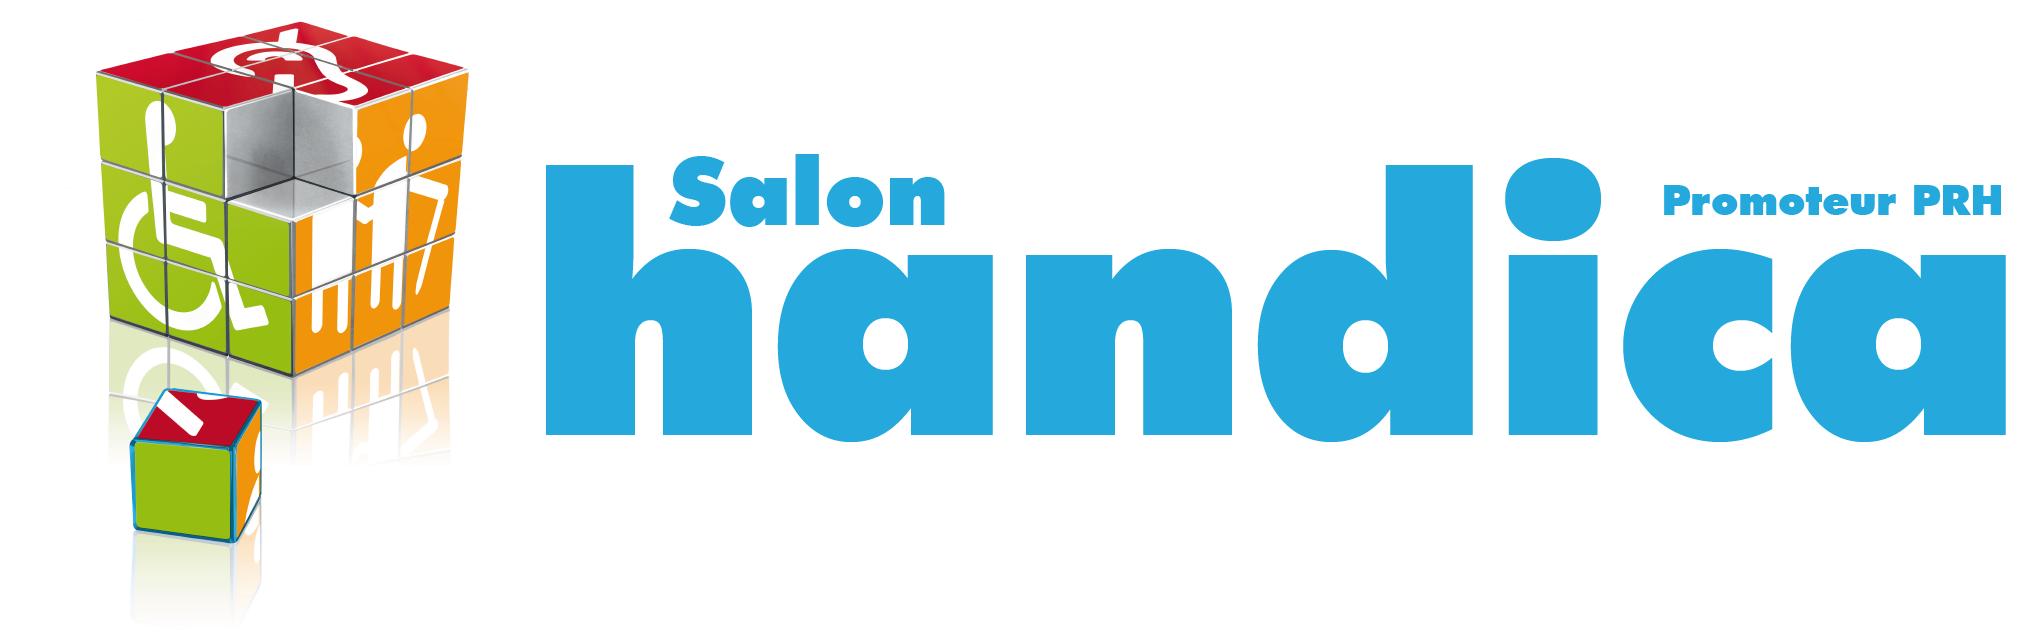 Salon Handica